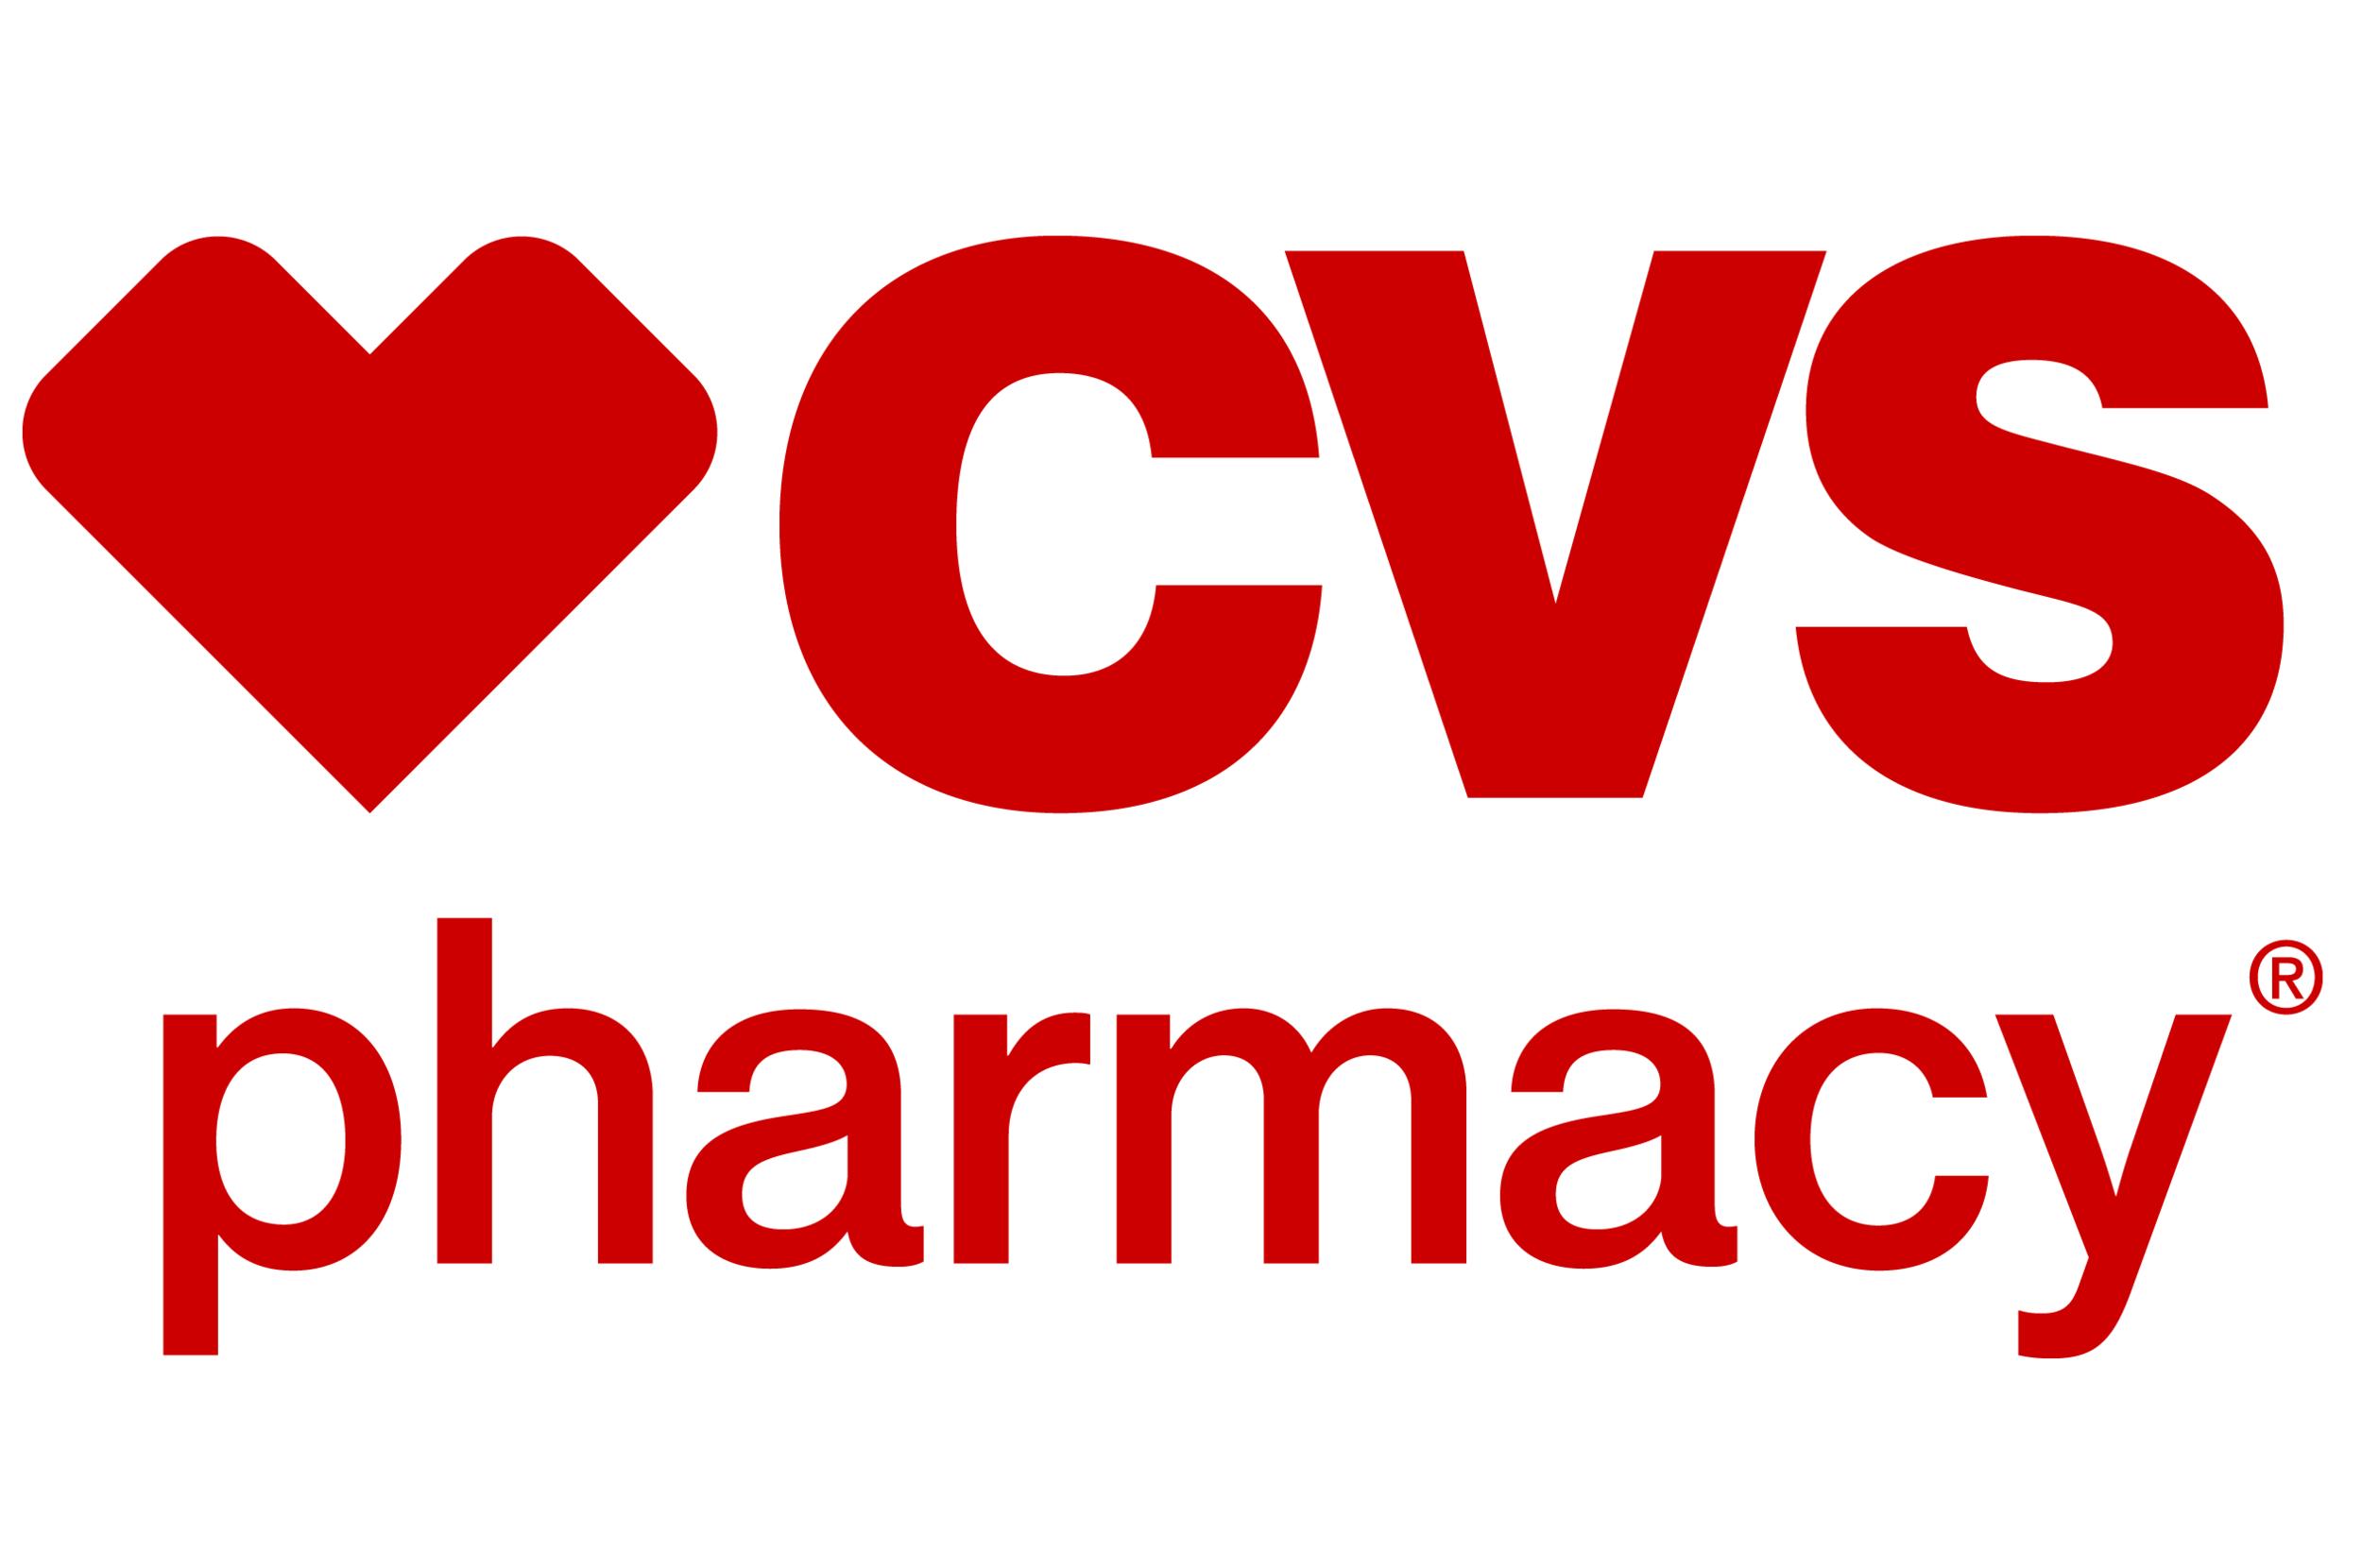 cvs-pharmacy-logo-stacked_0.png